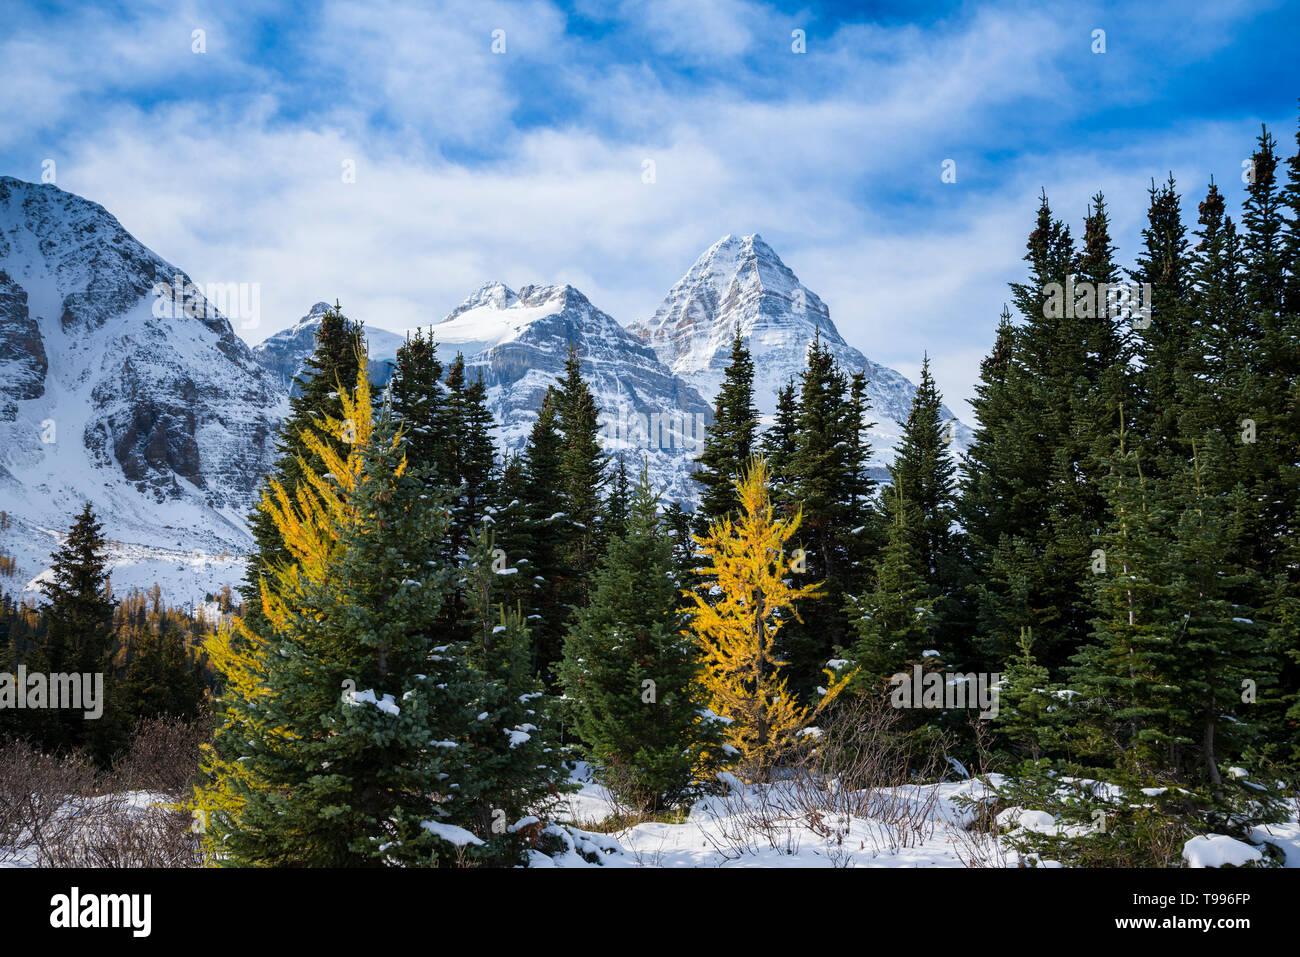 Mount Assiniboine Provincial Park, British Columbia, Canada Stock Photo